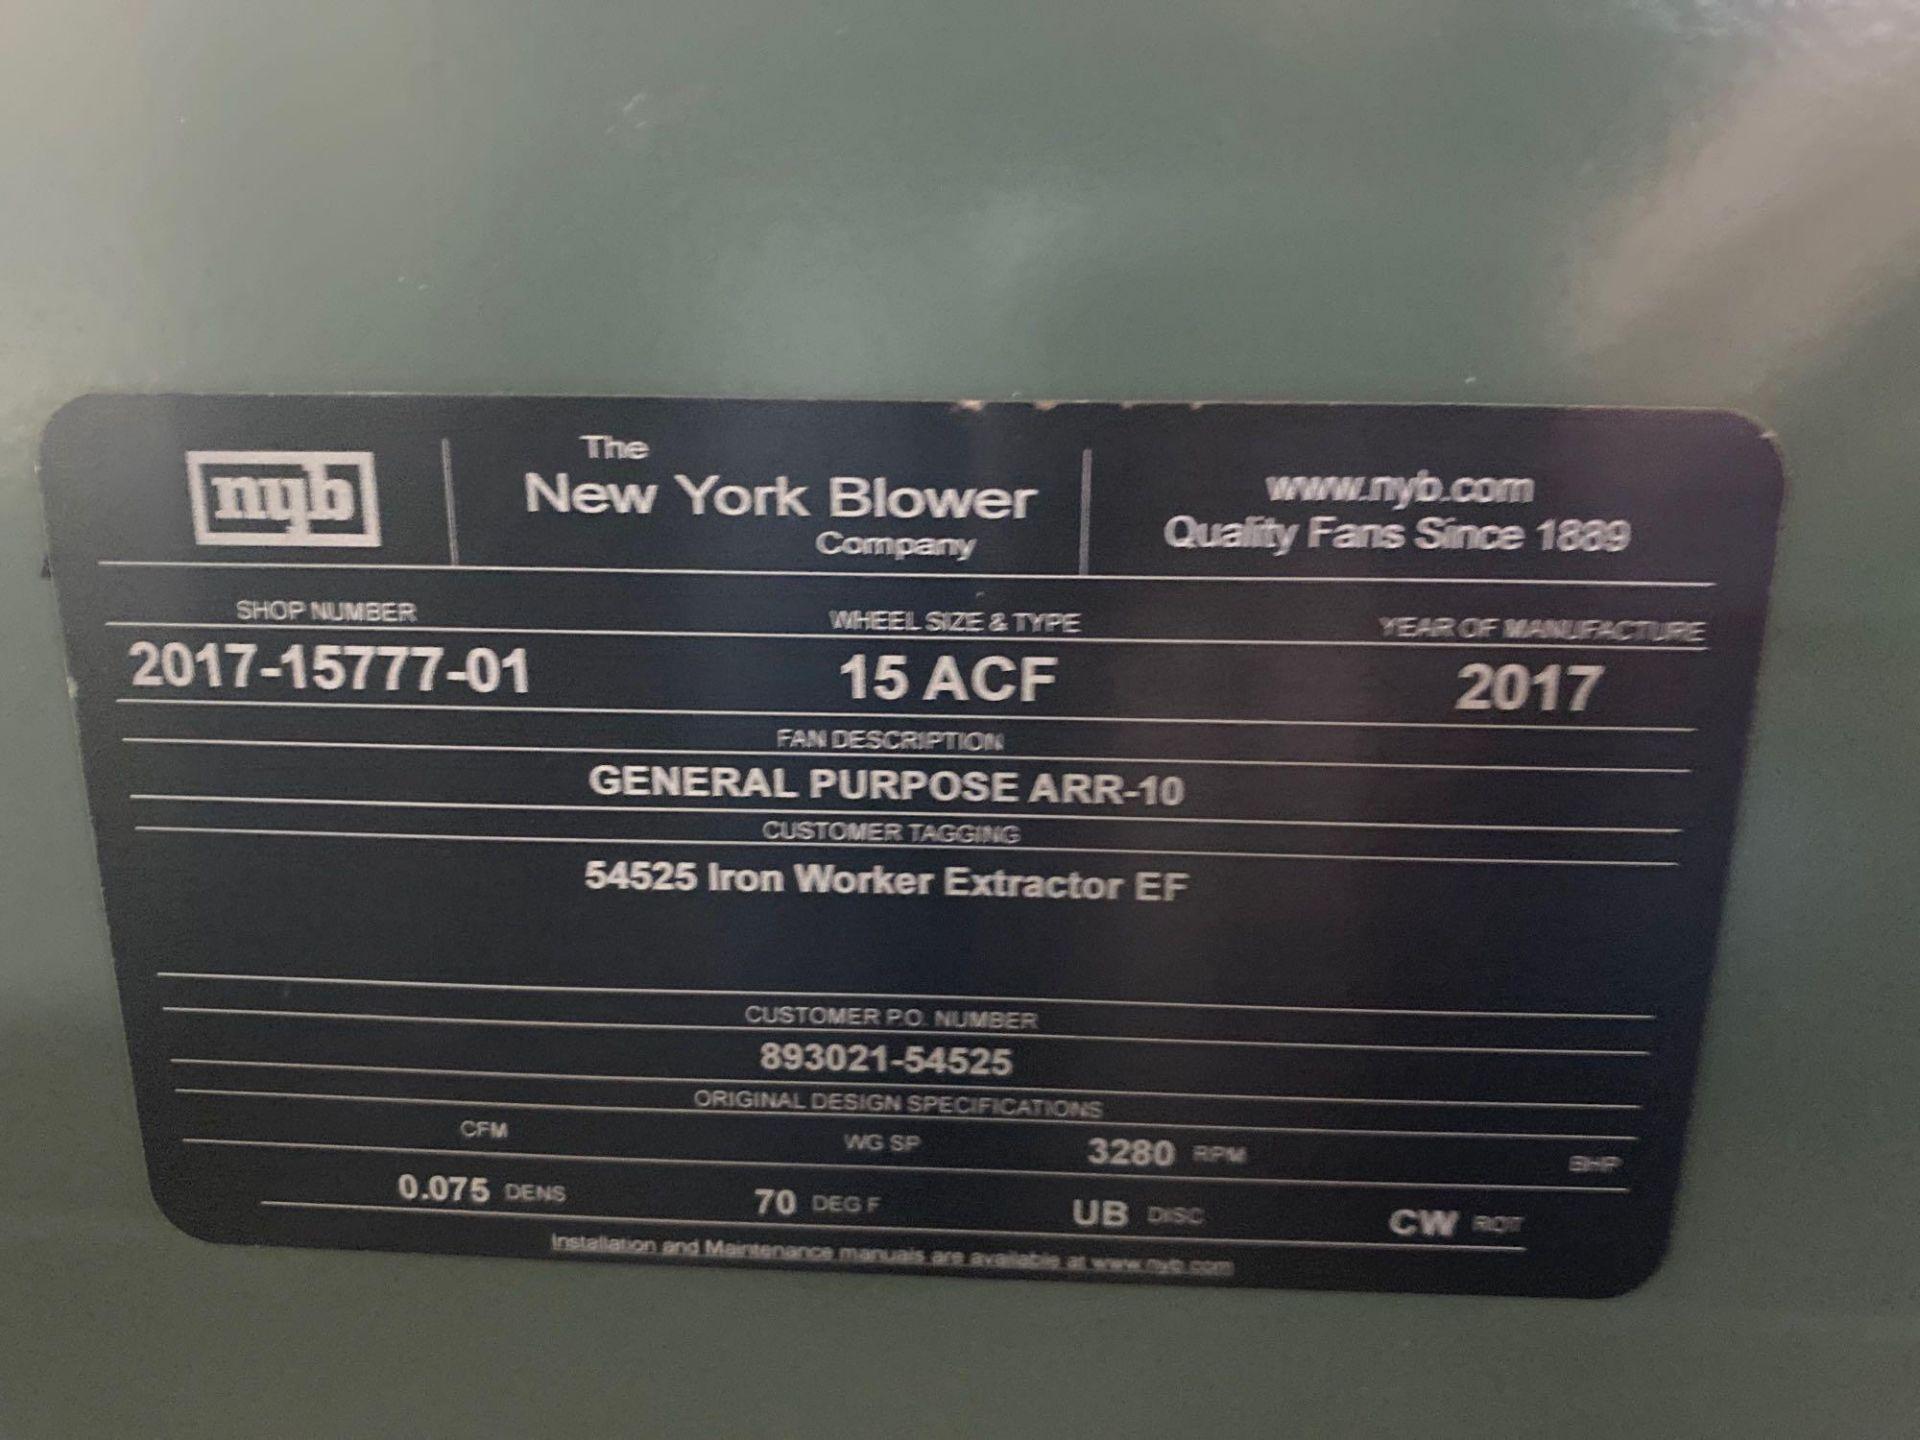 New York Blower Company - Image 4 of 8